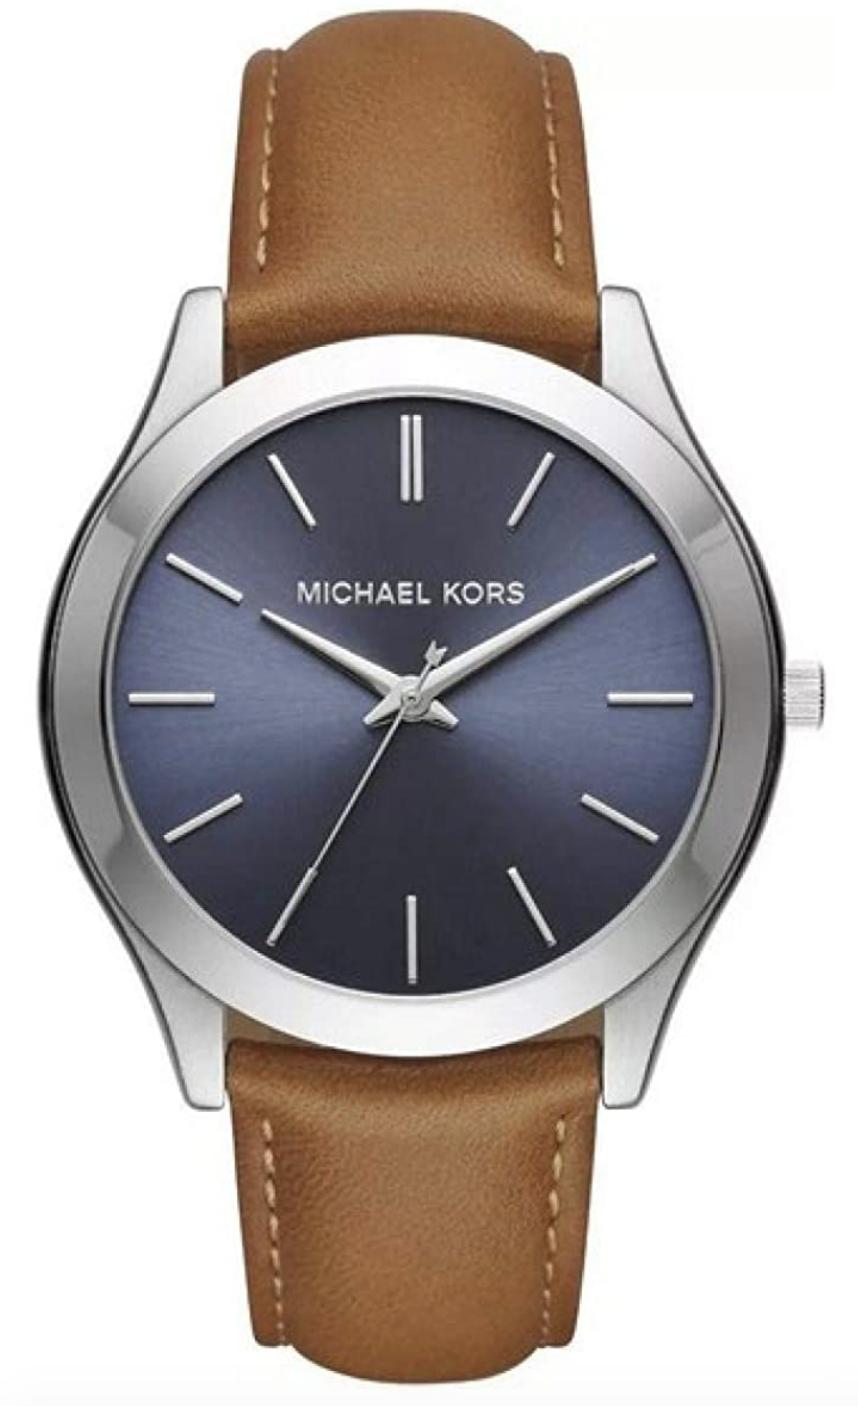 Reloj Michael Kors para Hombre (Mínimo histórico)